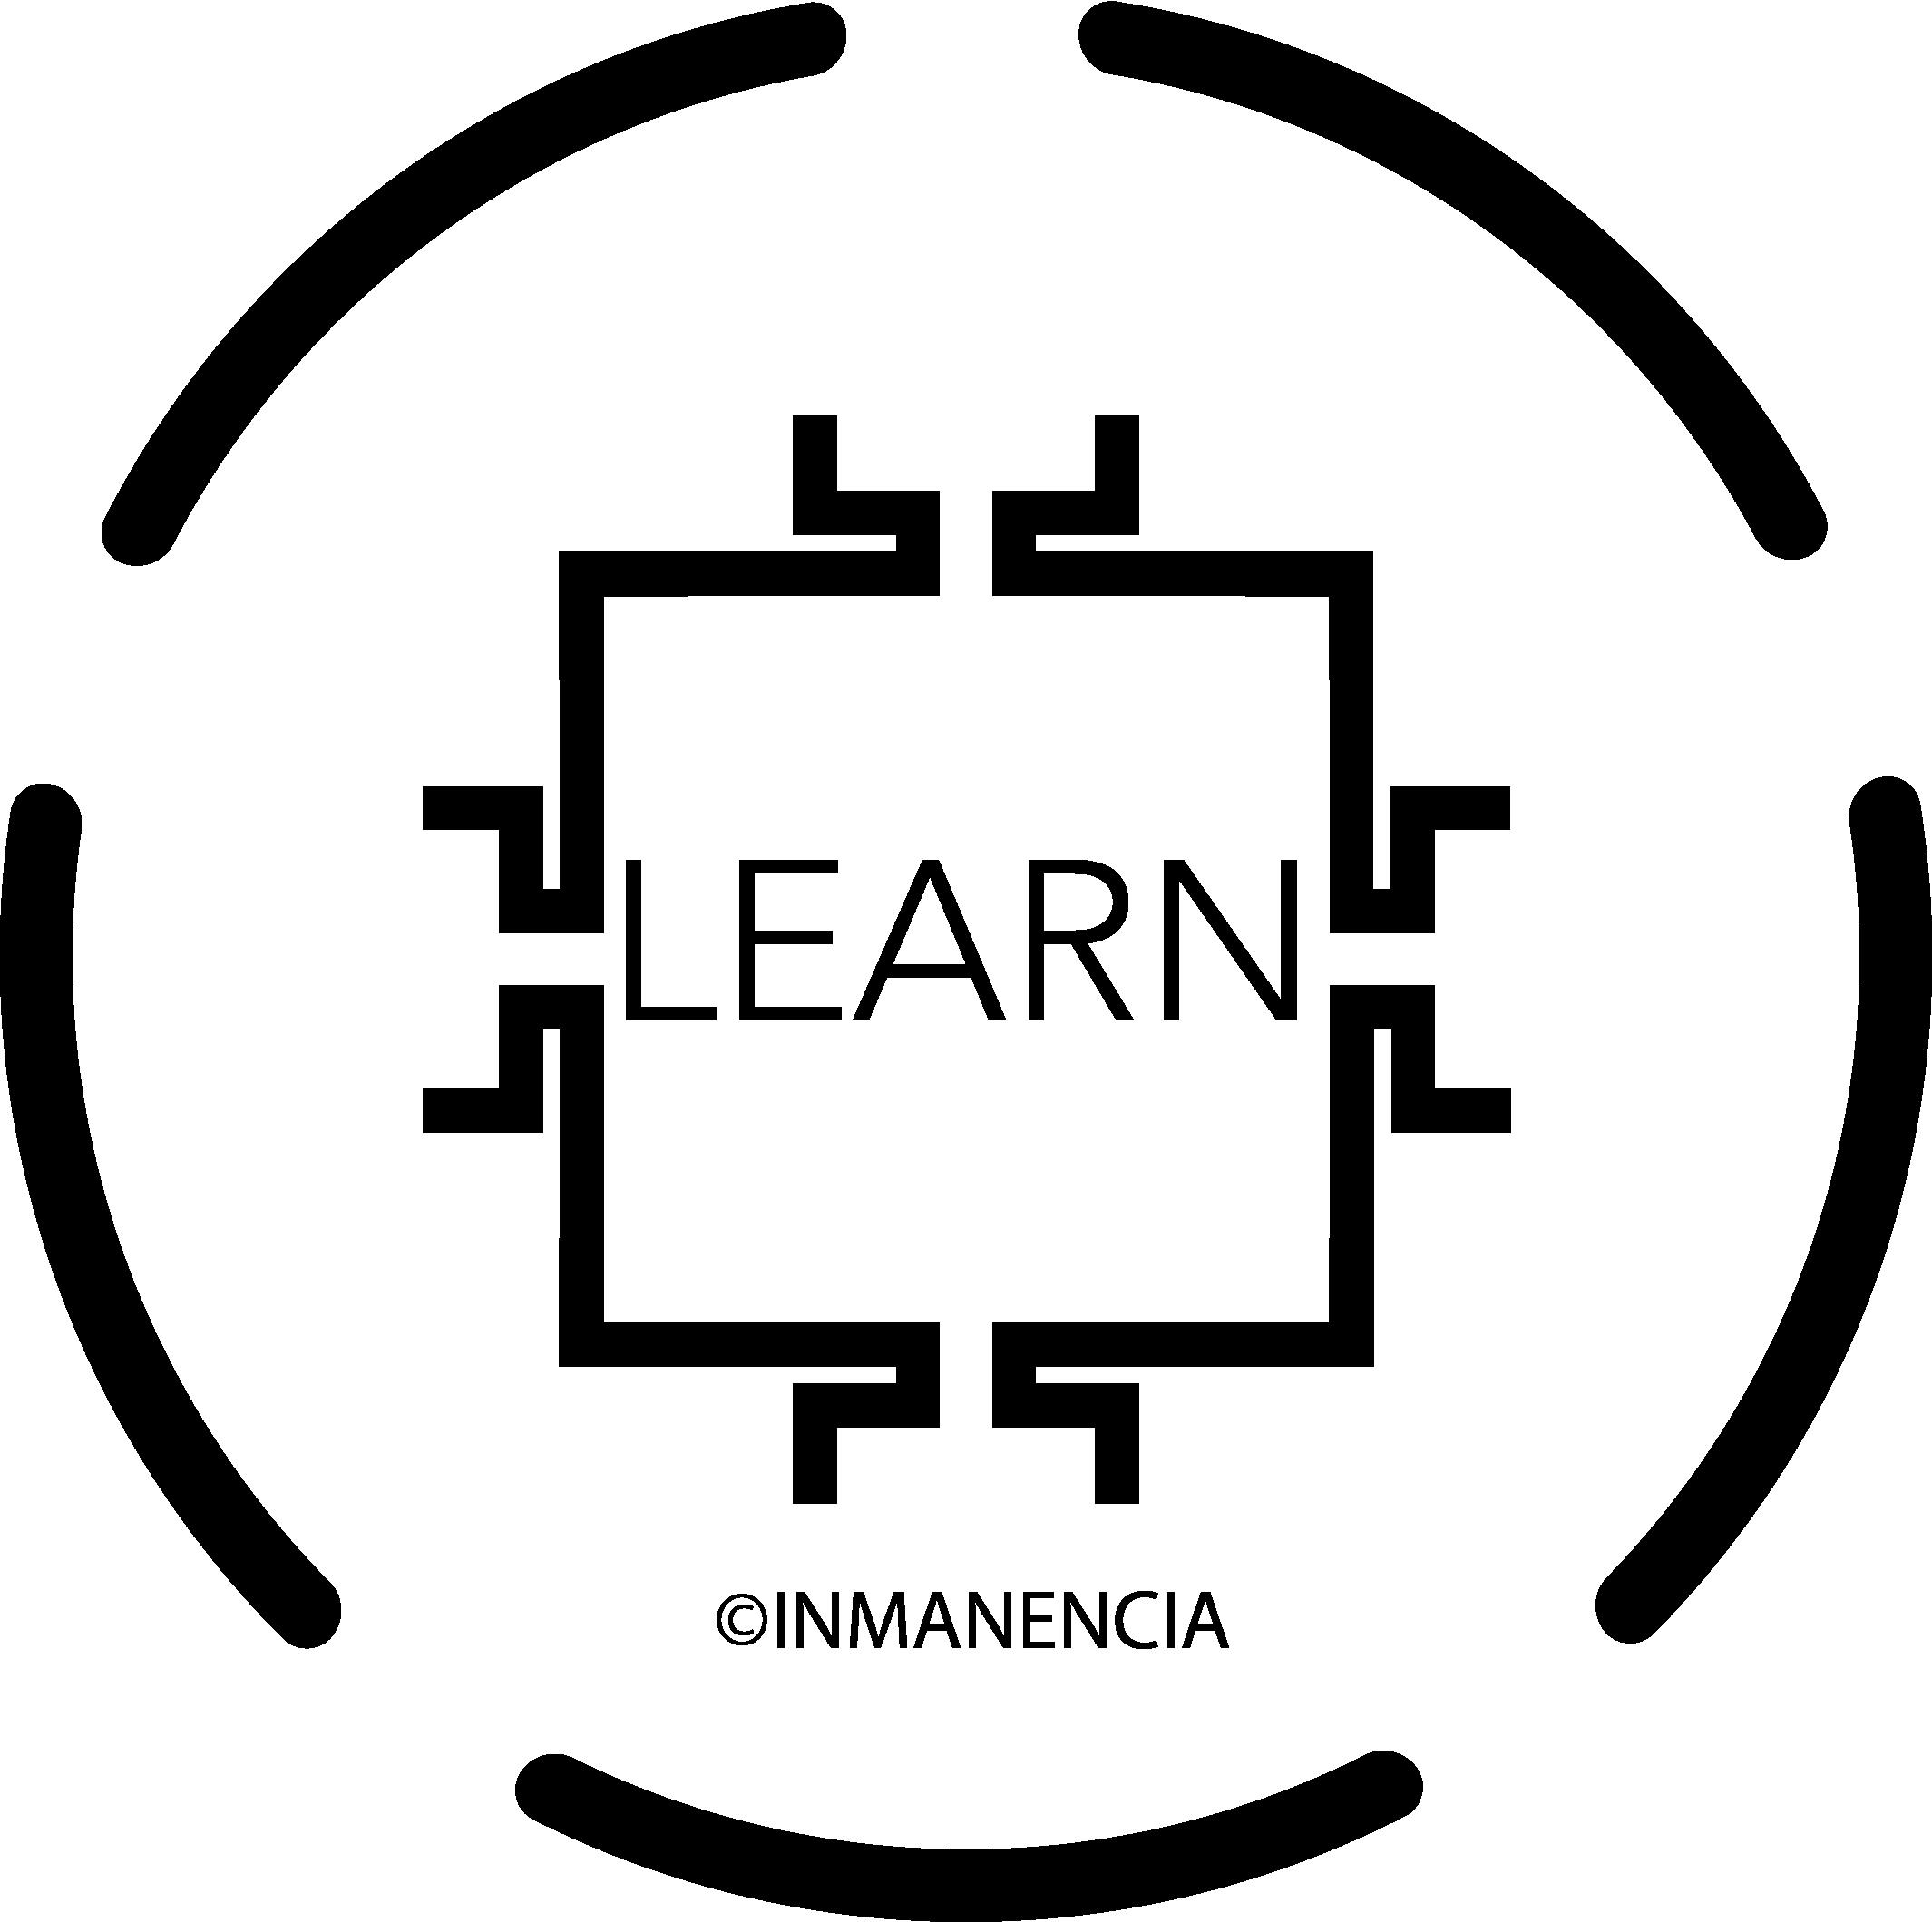 INMANENCIA LEARN, apprendre la programmation autrement